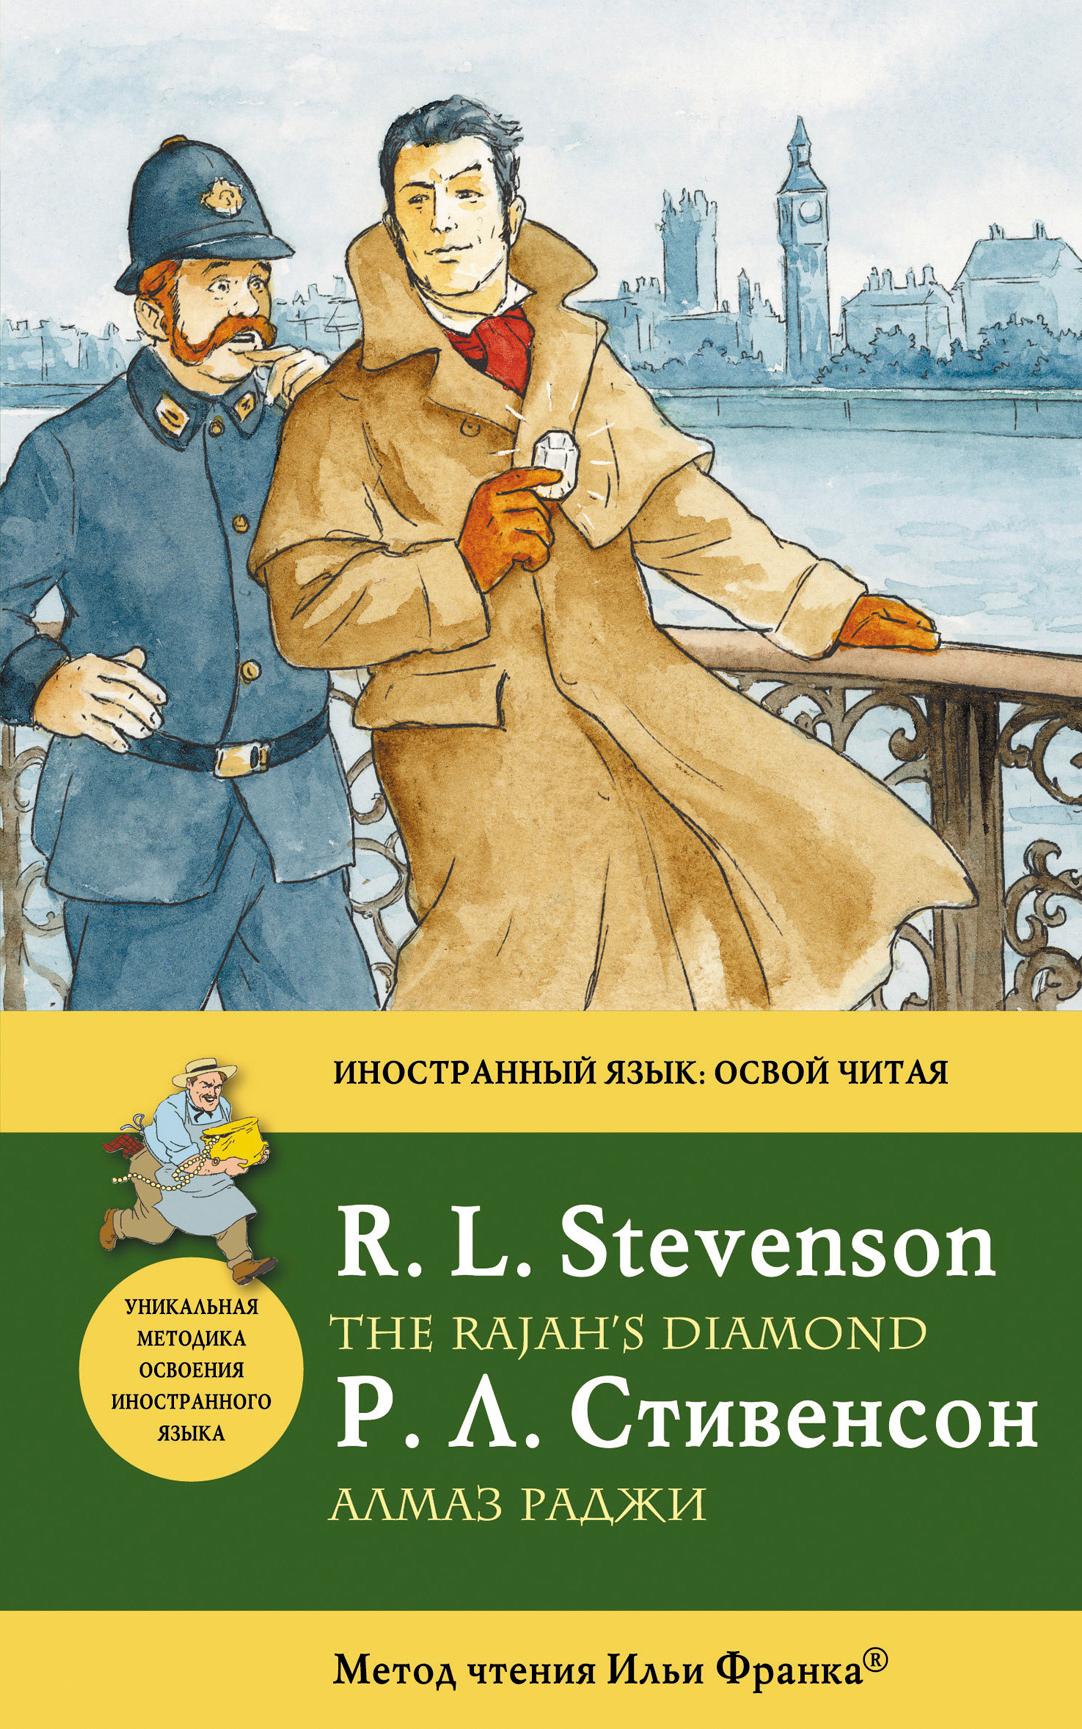 Алмаз раджи = The Rajah's Diamond: метод чтения Ильи Франка